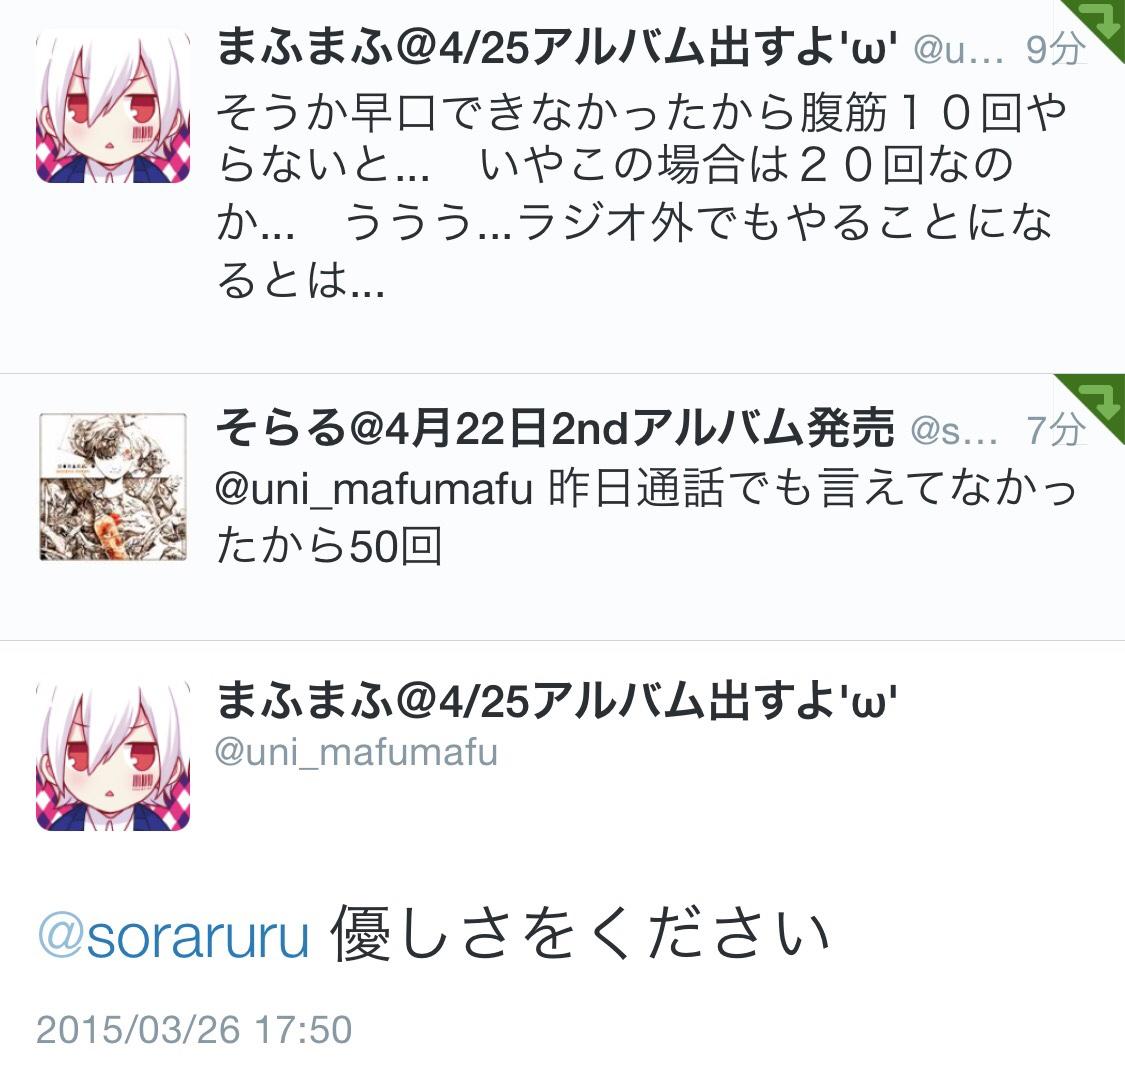 drama.nagoya. 150326そらるまふまふ新投Twitter .